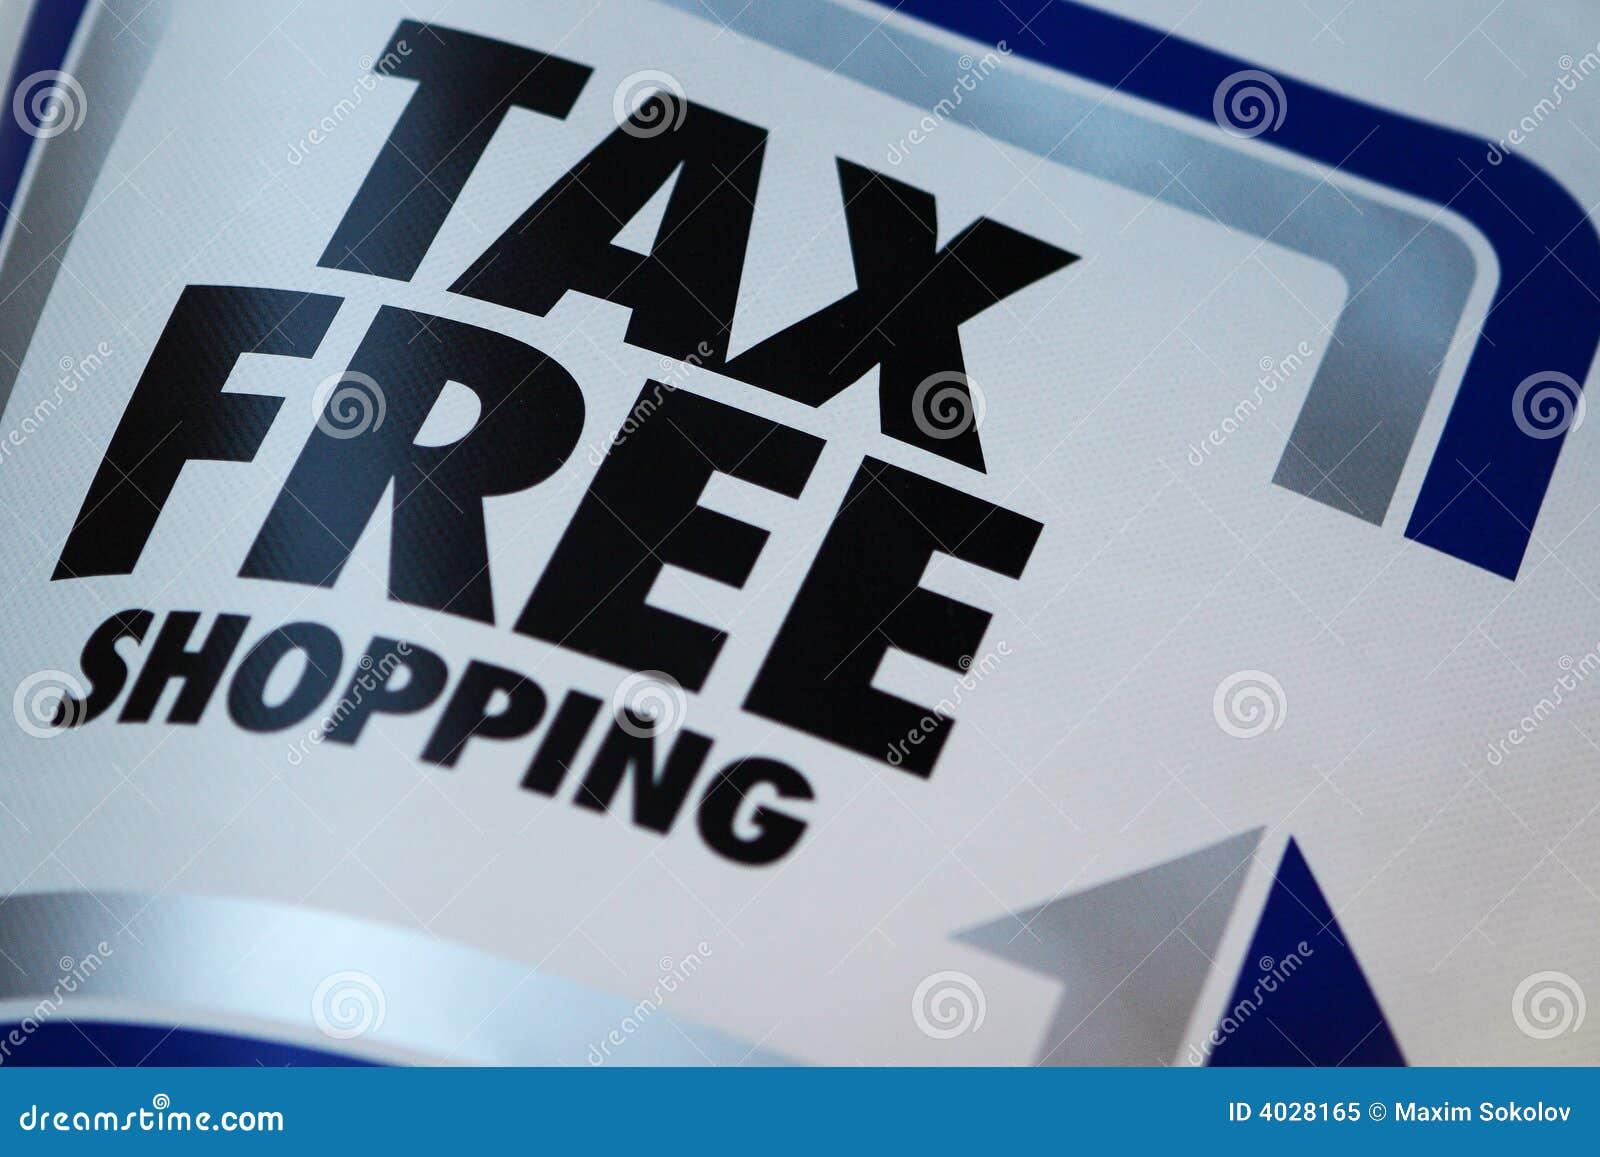 Fri shoppingskatt